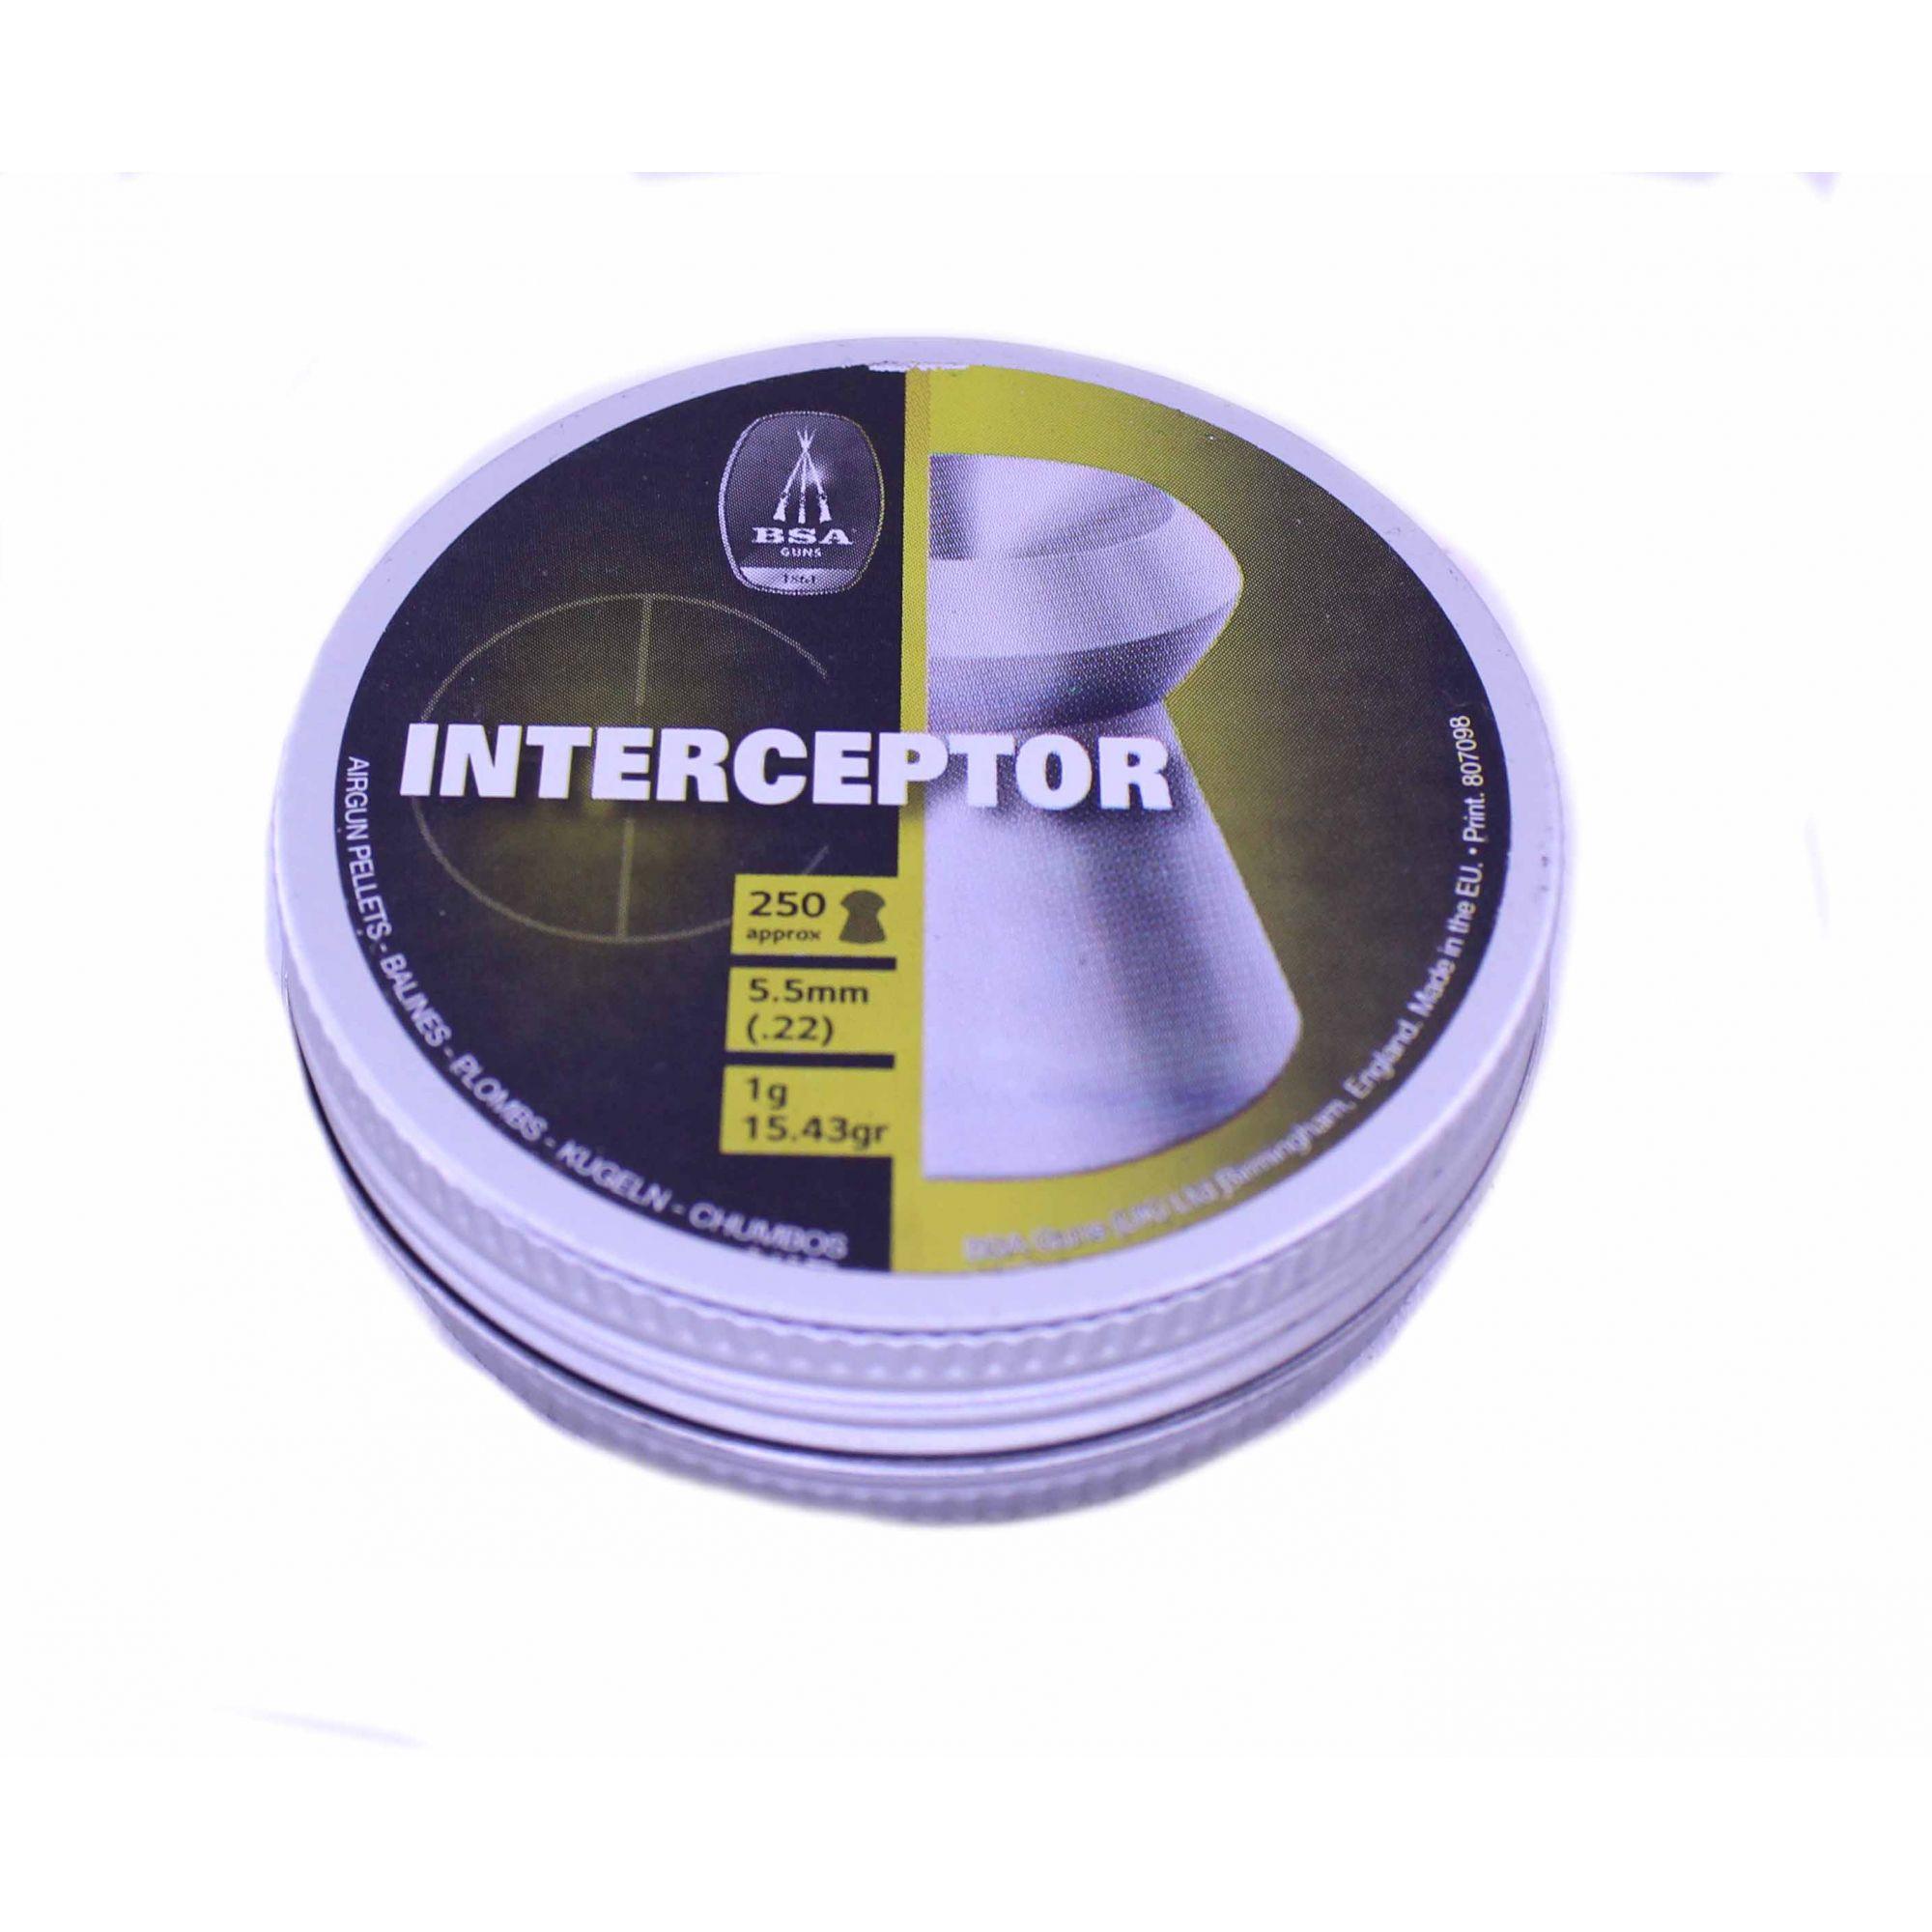 Chumbinho Interceptor .22/ 5.5mm